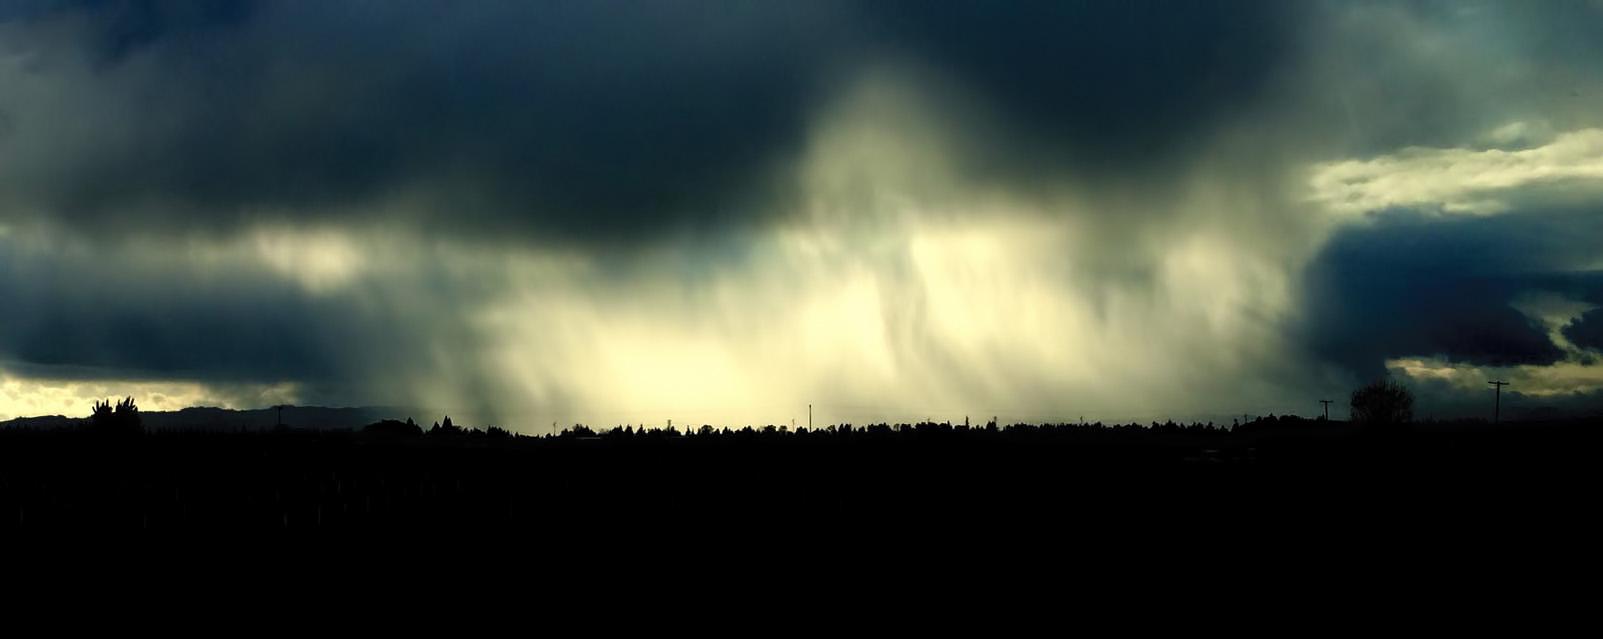 Dramatic Rain Curtain Keizer Oregon.jpg